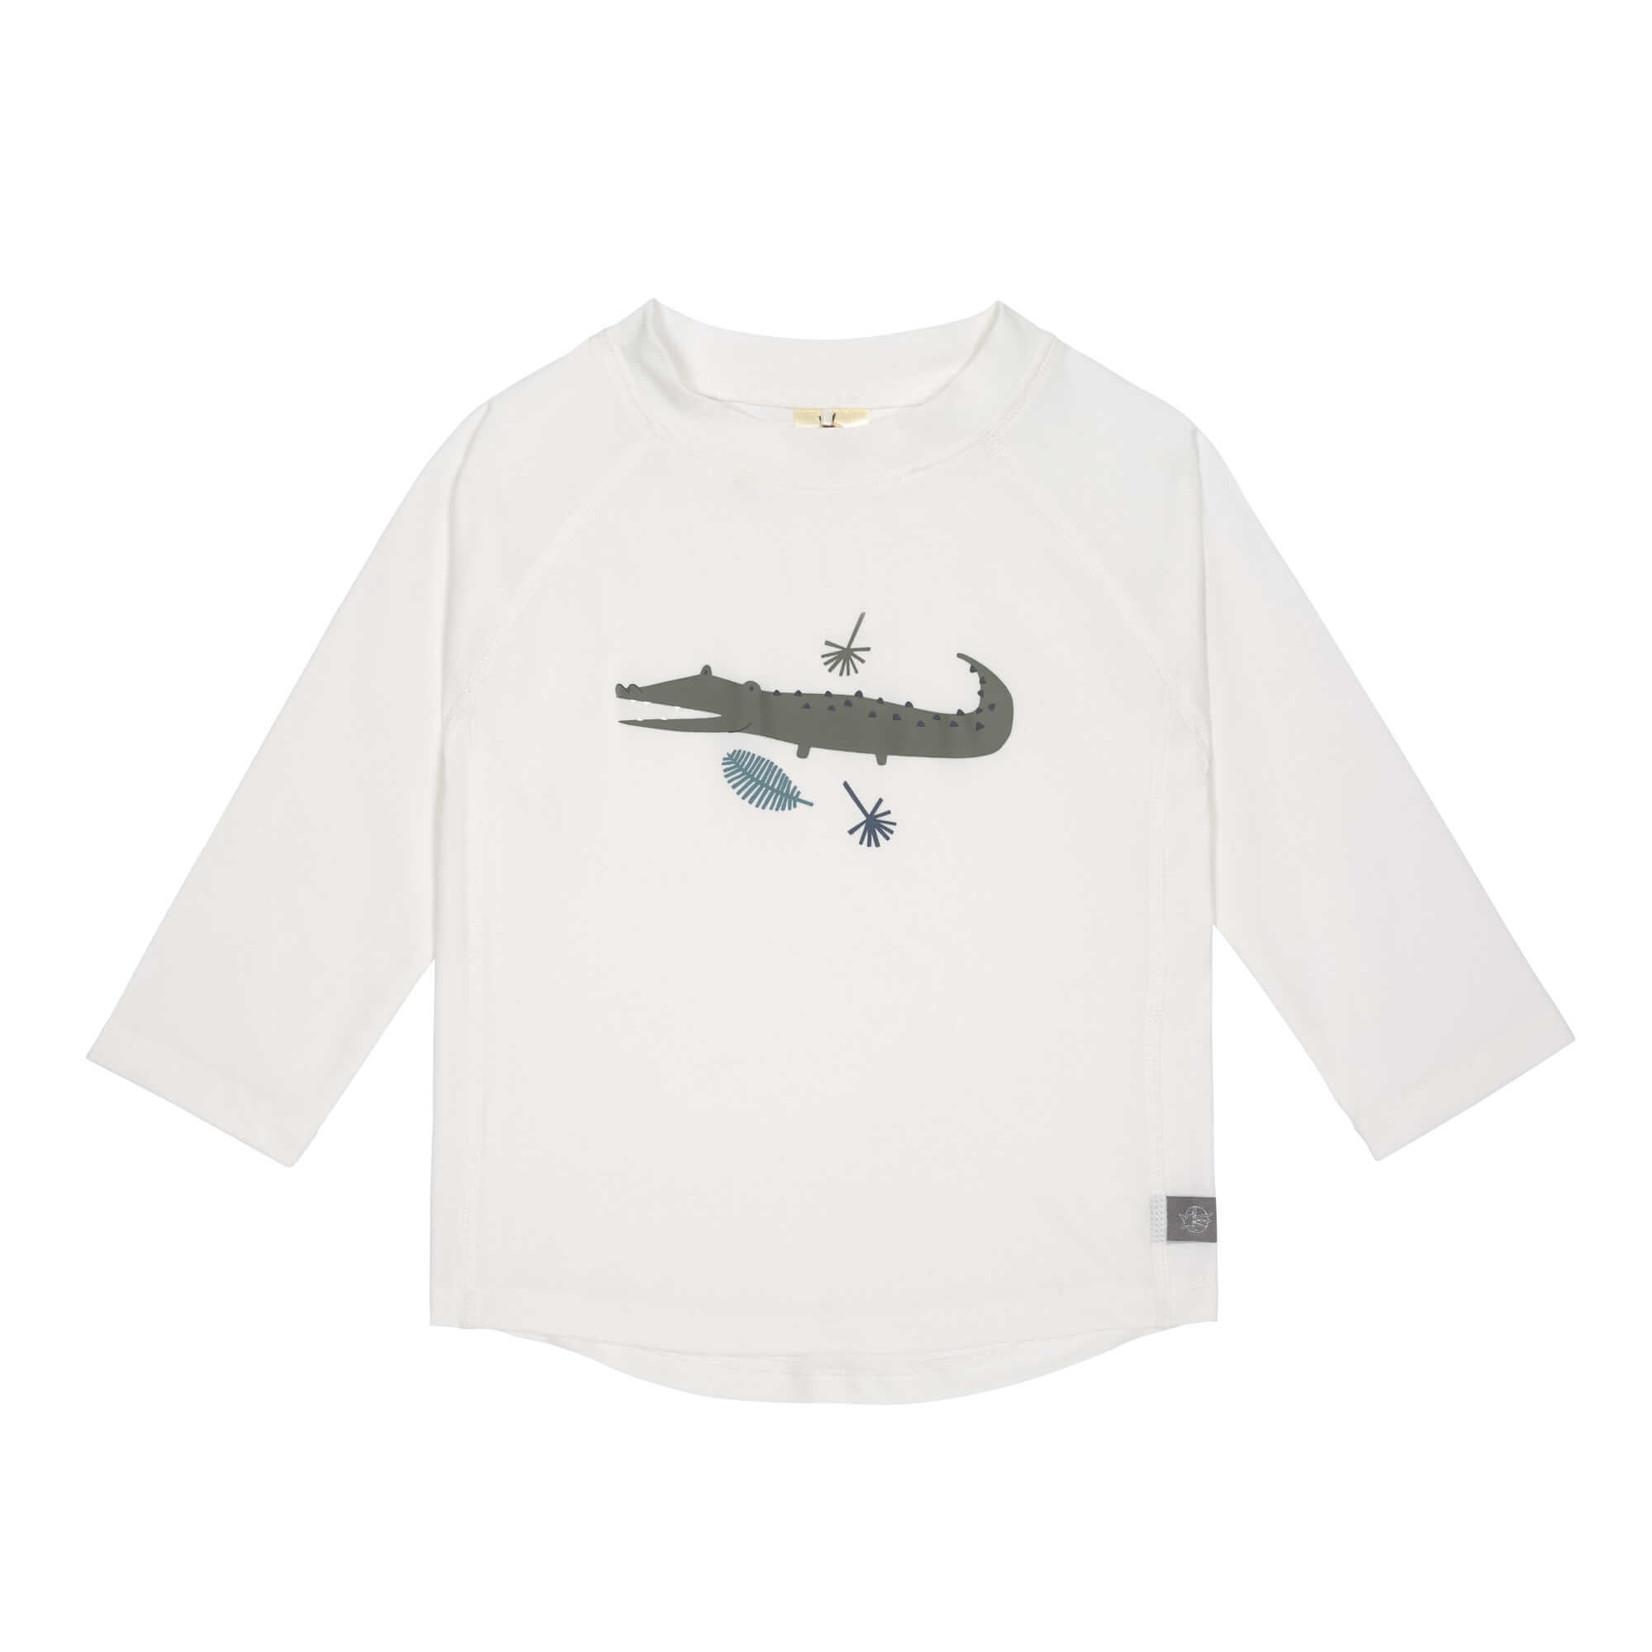 Lässig UV-shirt lange mouw (Krokodil wit)